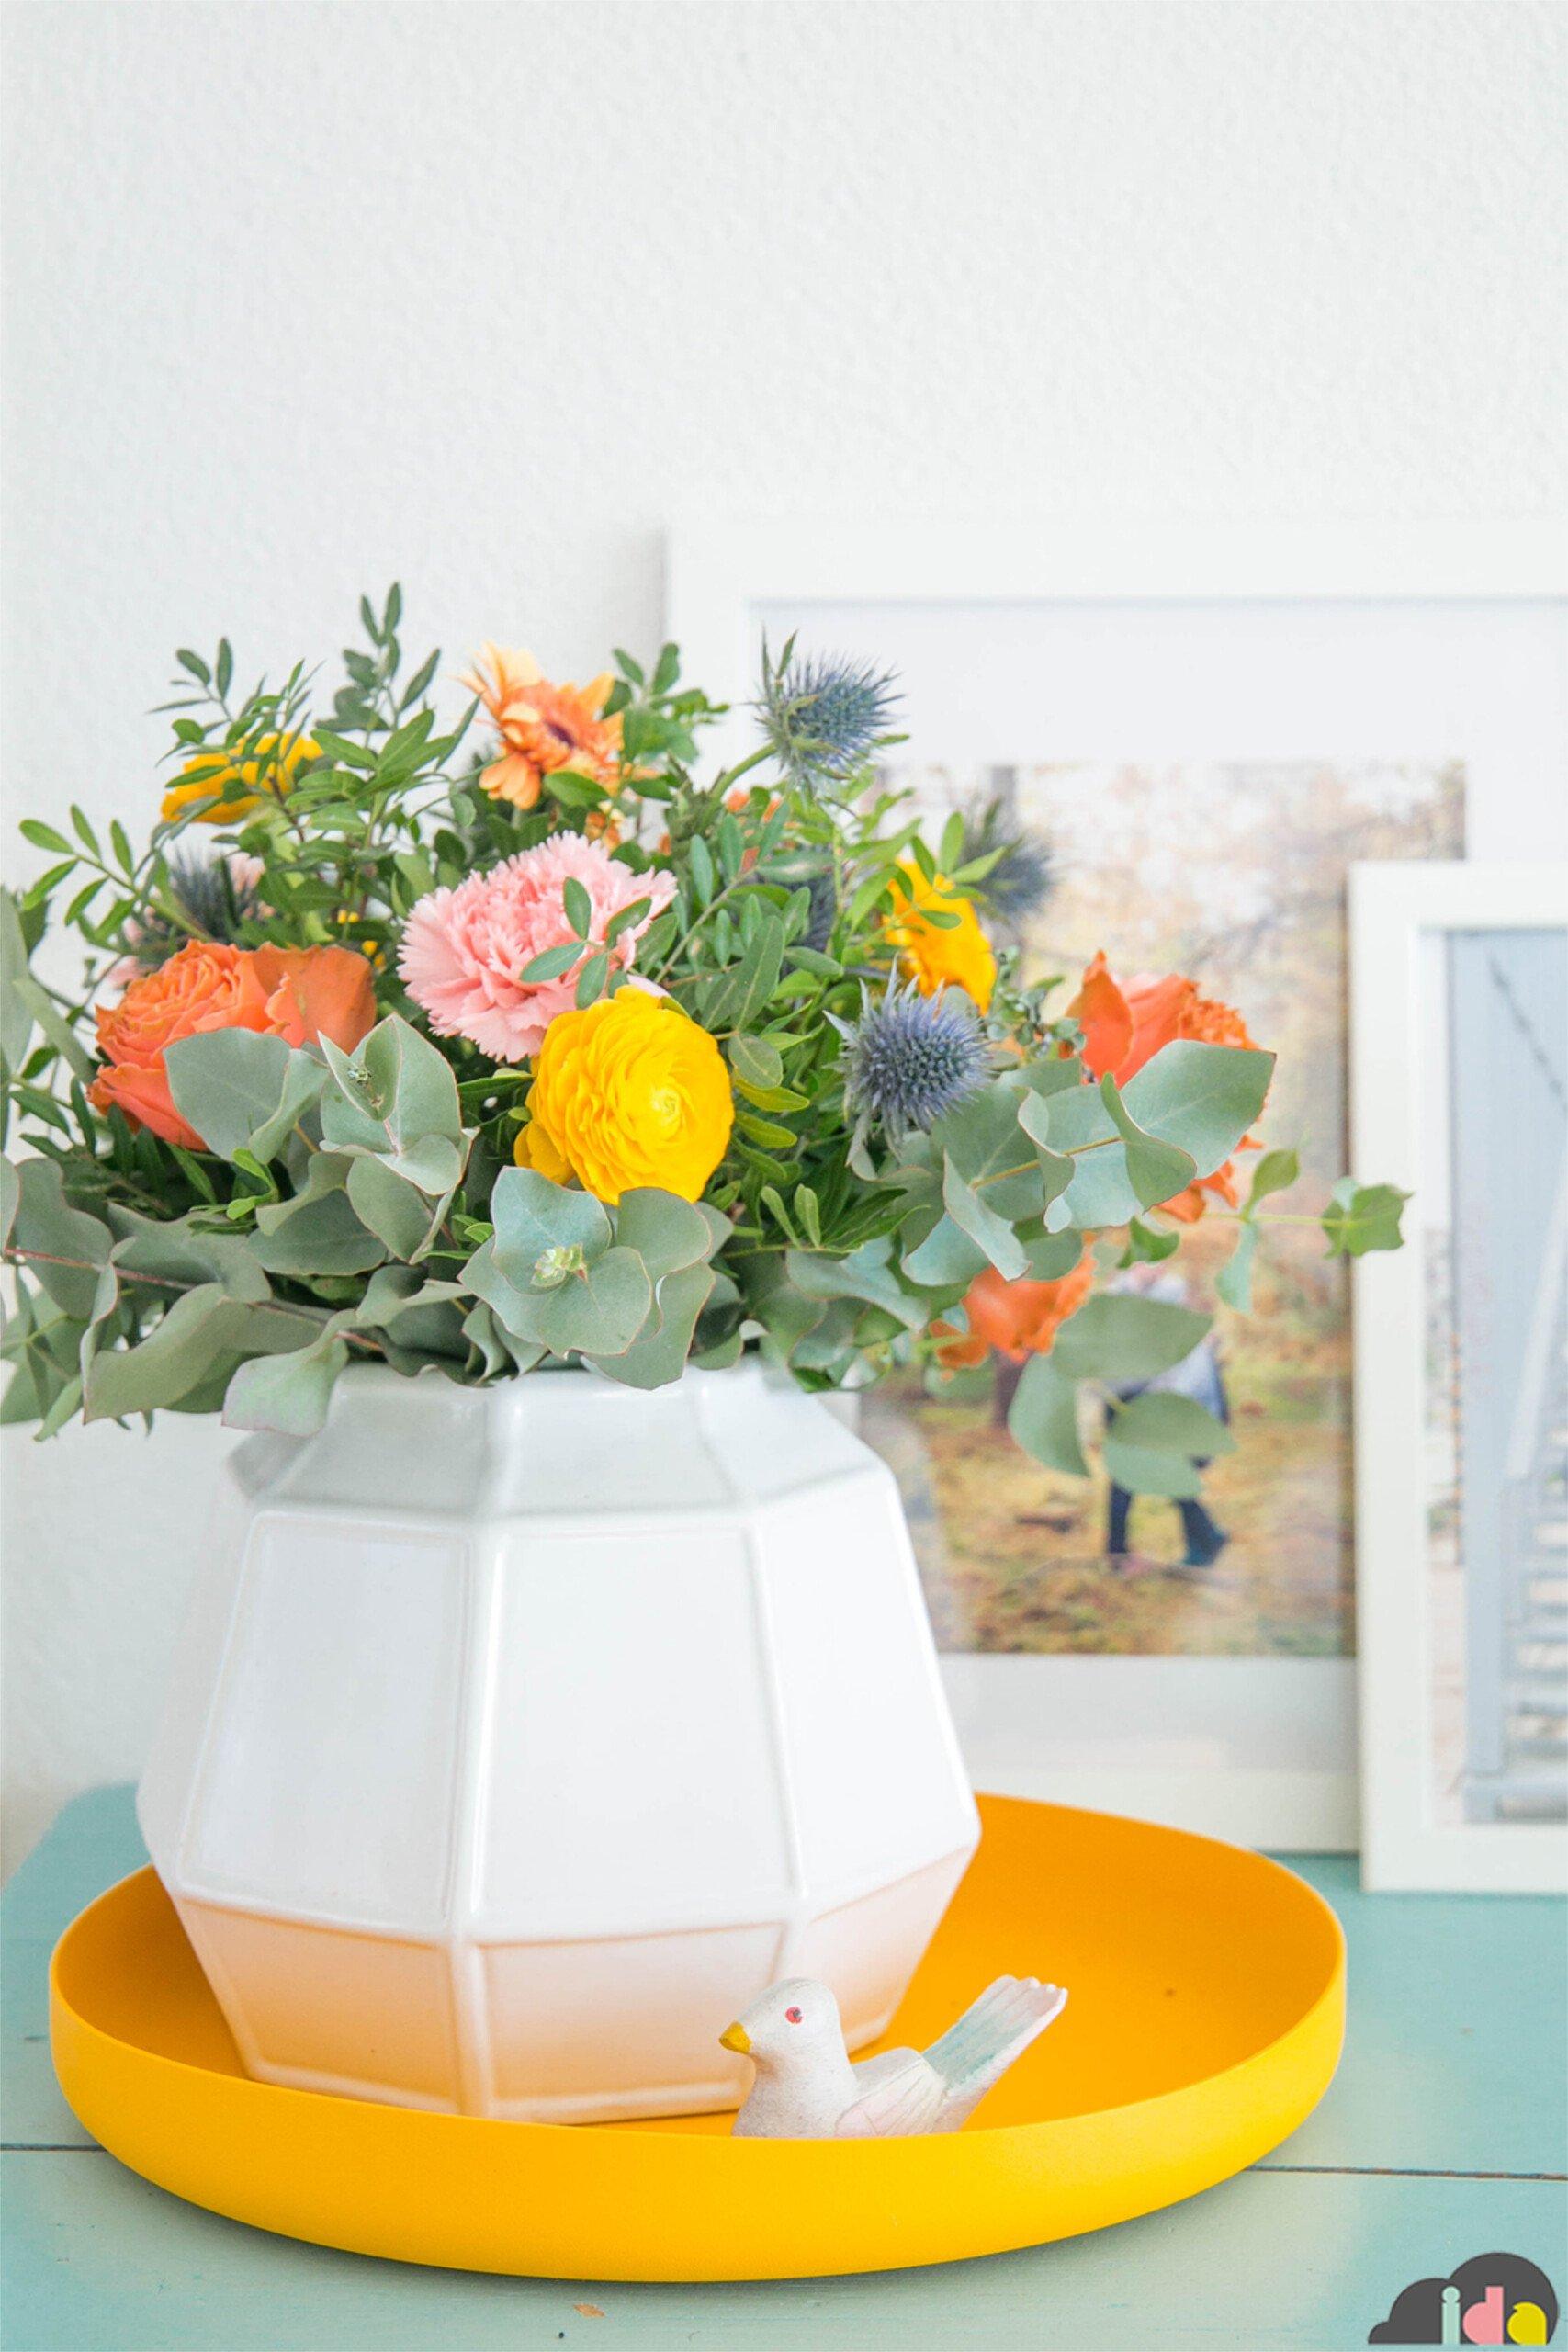 IDAinteriorlifestyle 12 flowers details home scaled